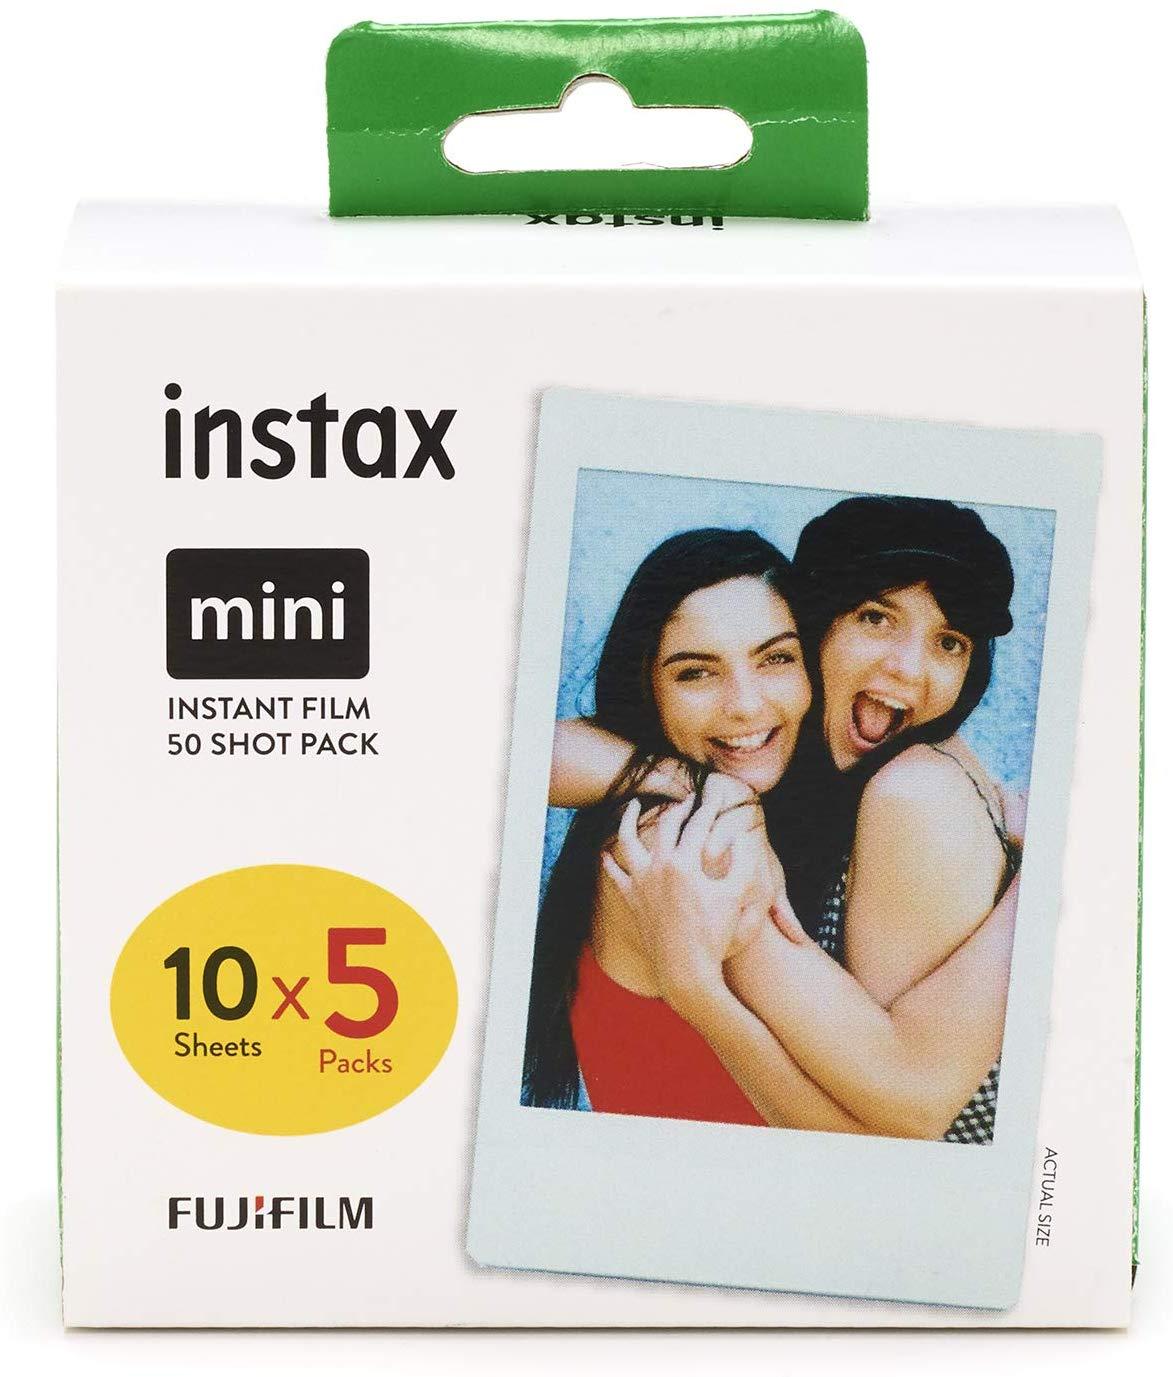 Instax mini film 50 shot pack £29.99 Amazon